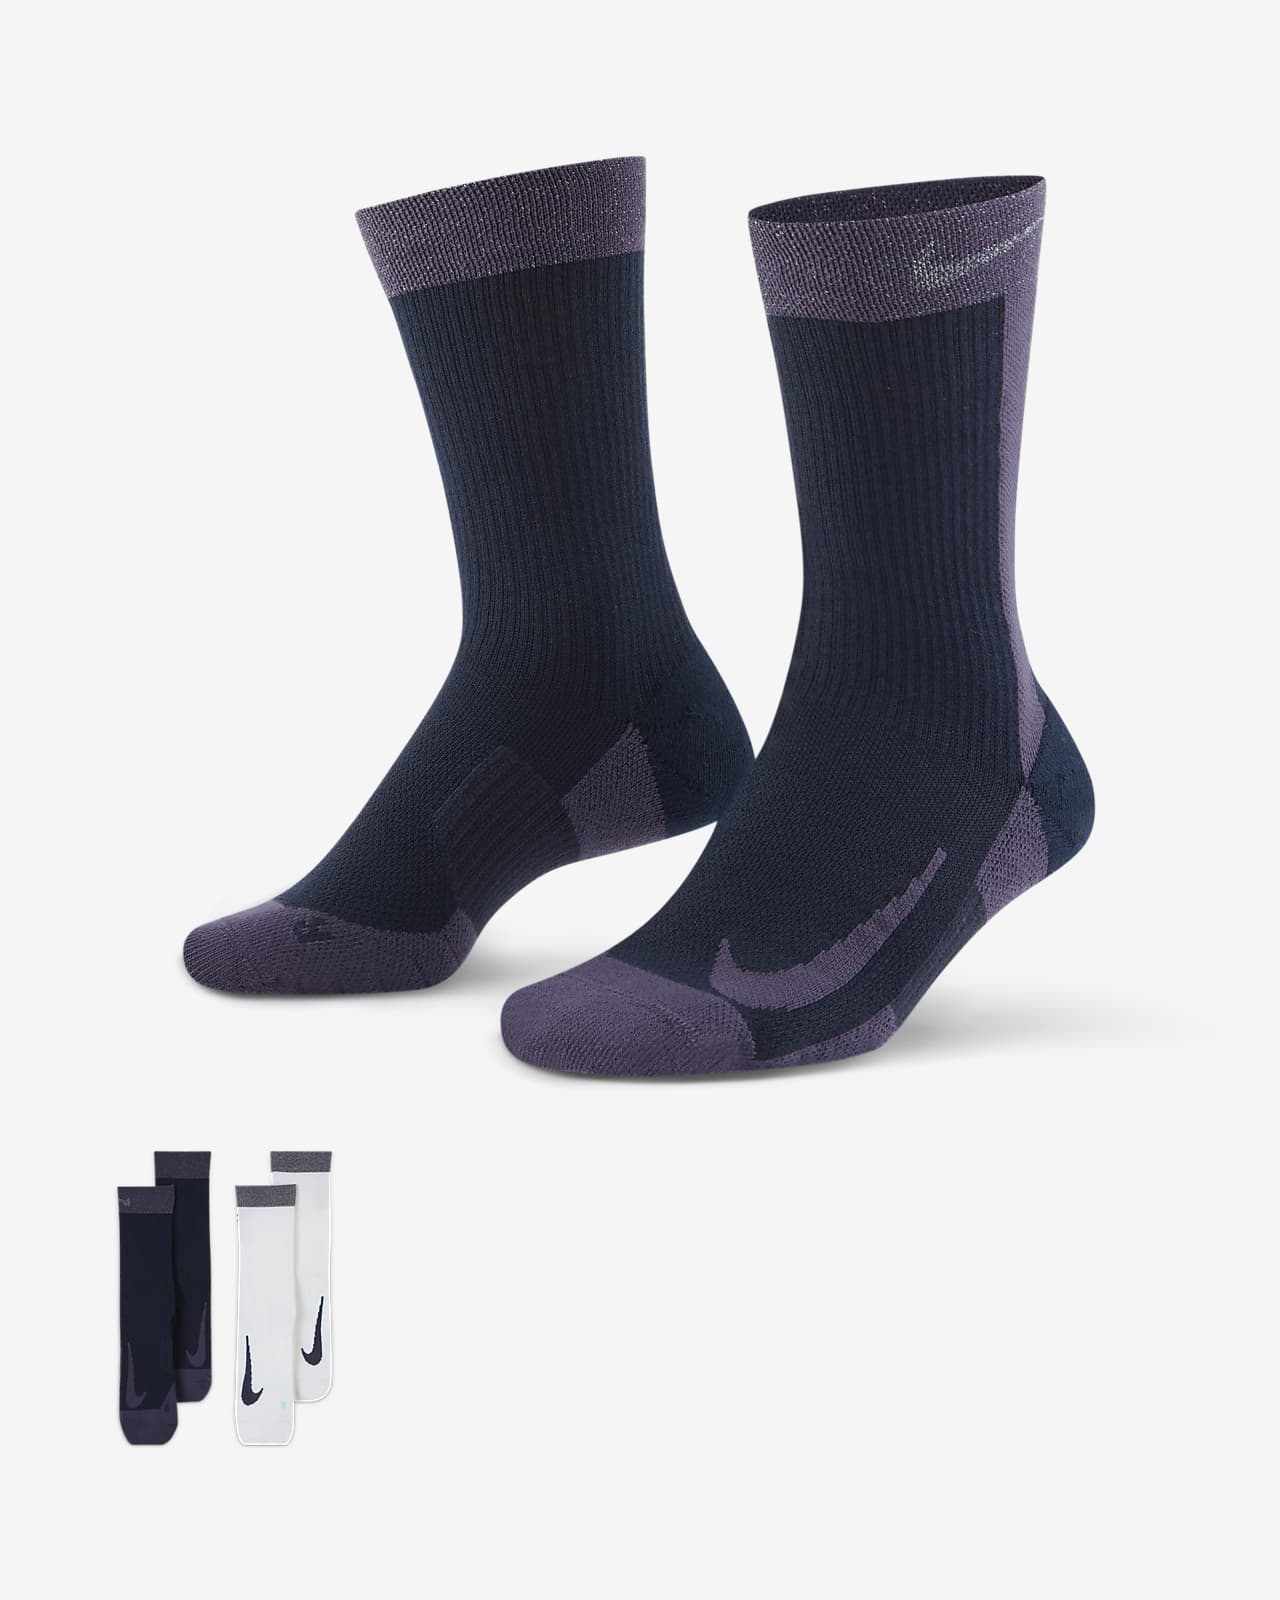 NikeCourt Multiplier Max Tennis Crew Socks (2 Pairs)